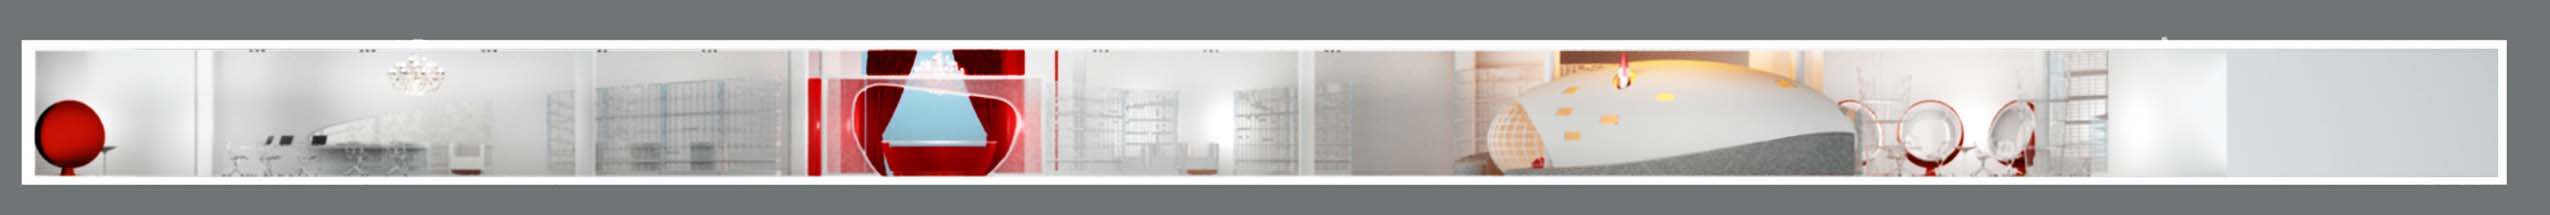 Emmanuel-Negroni-archivision